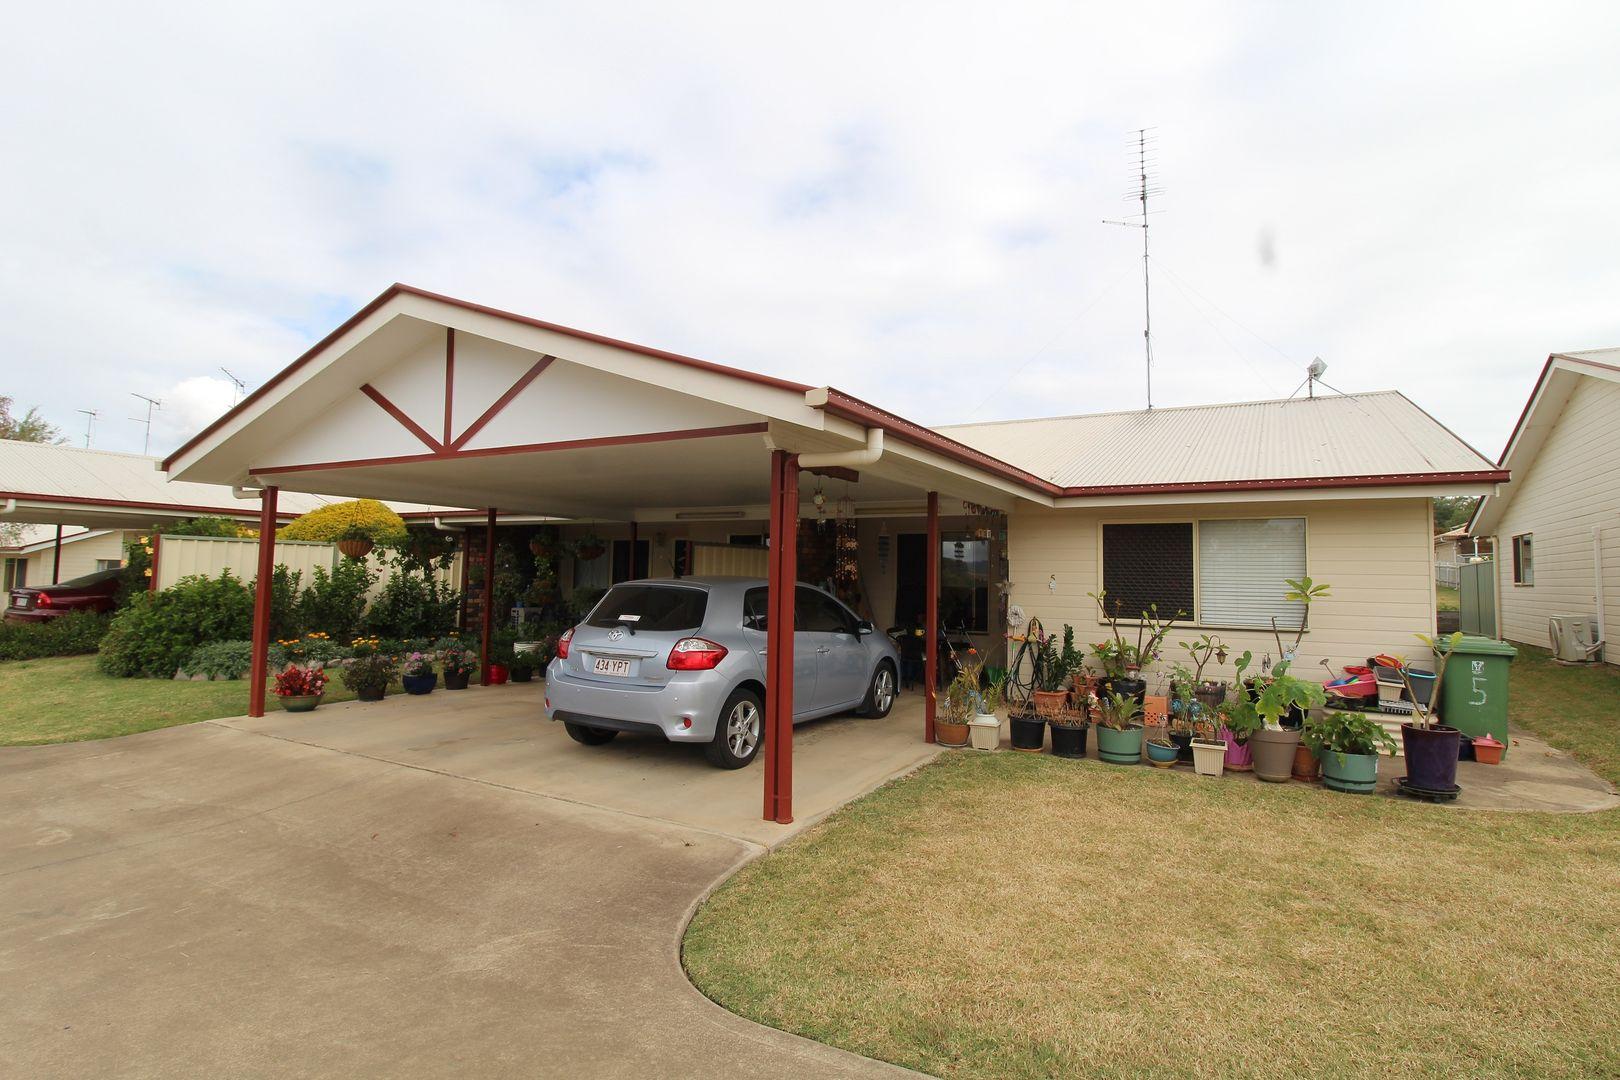 5/139 Cressbrook Street, Toogoolawah QLD 4313, Image 0